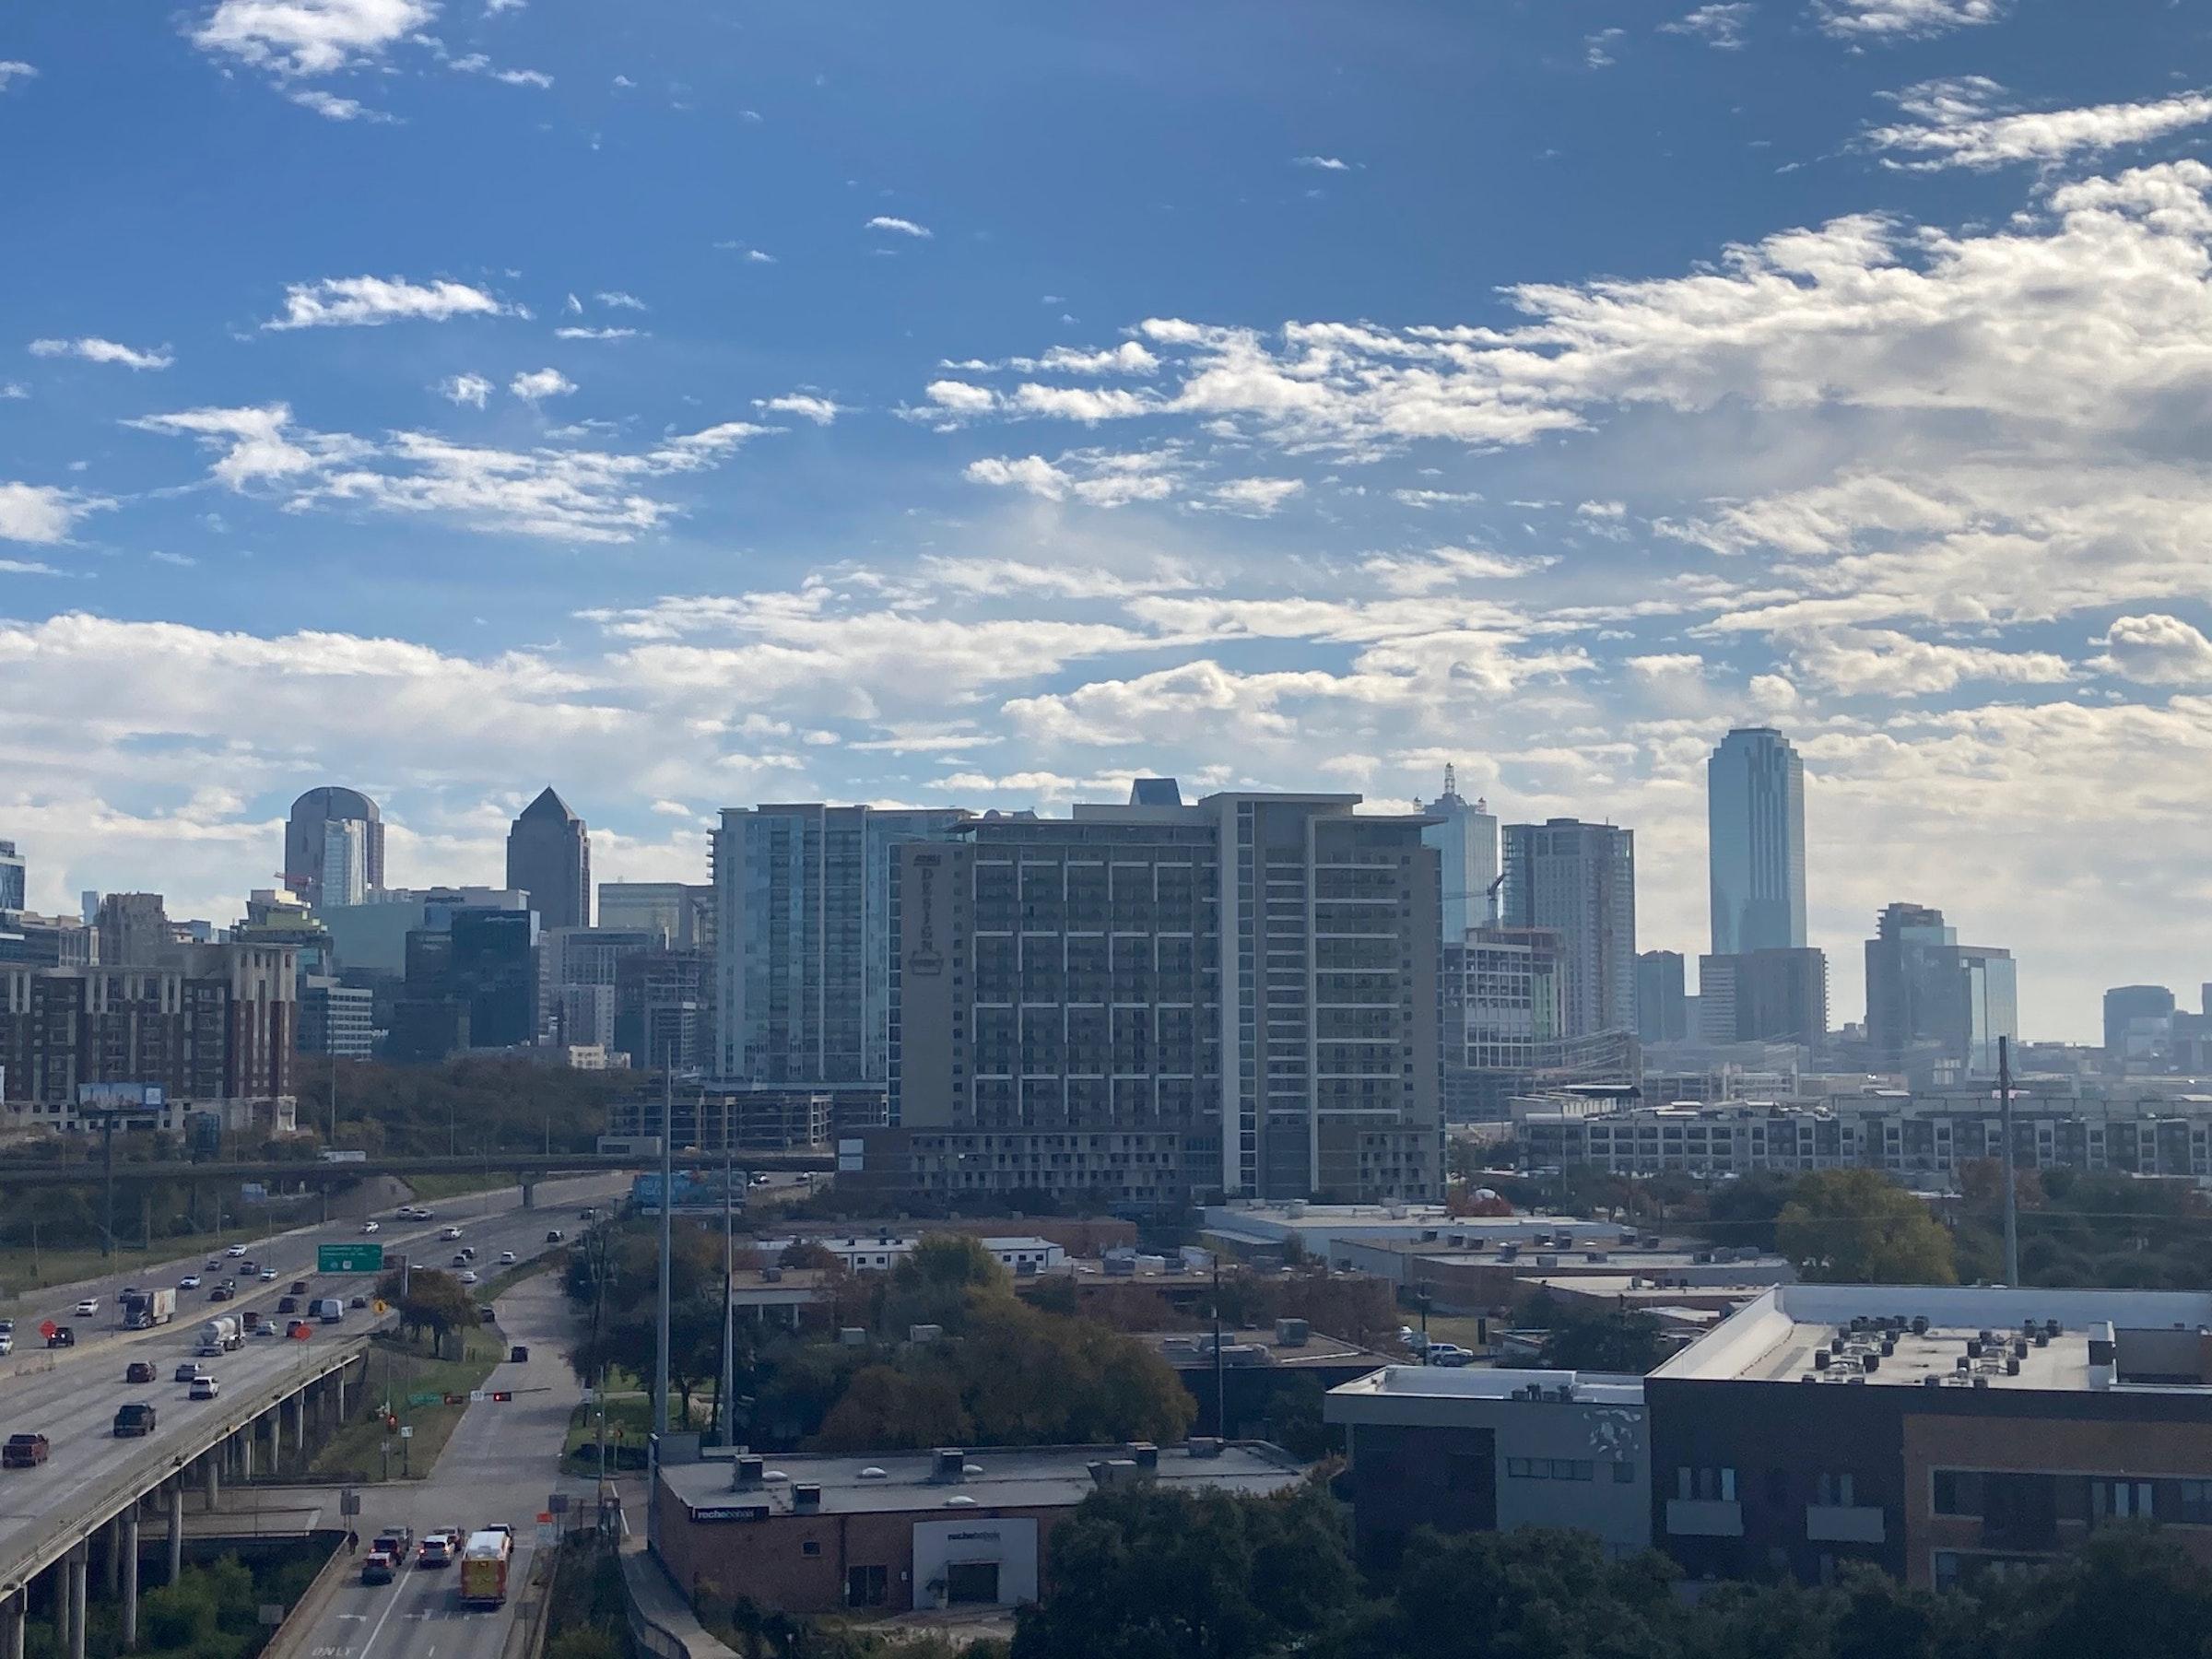 Tru by Hilton Dallas Downtown Market Center in Beyond Dallas